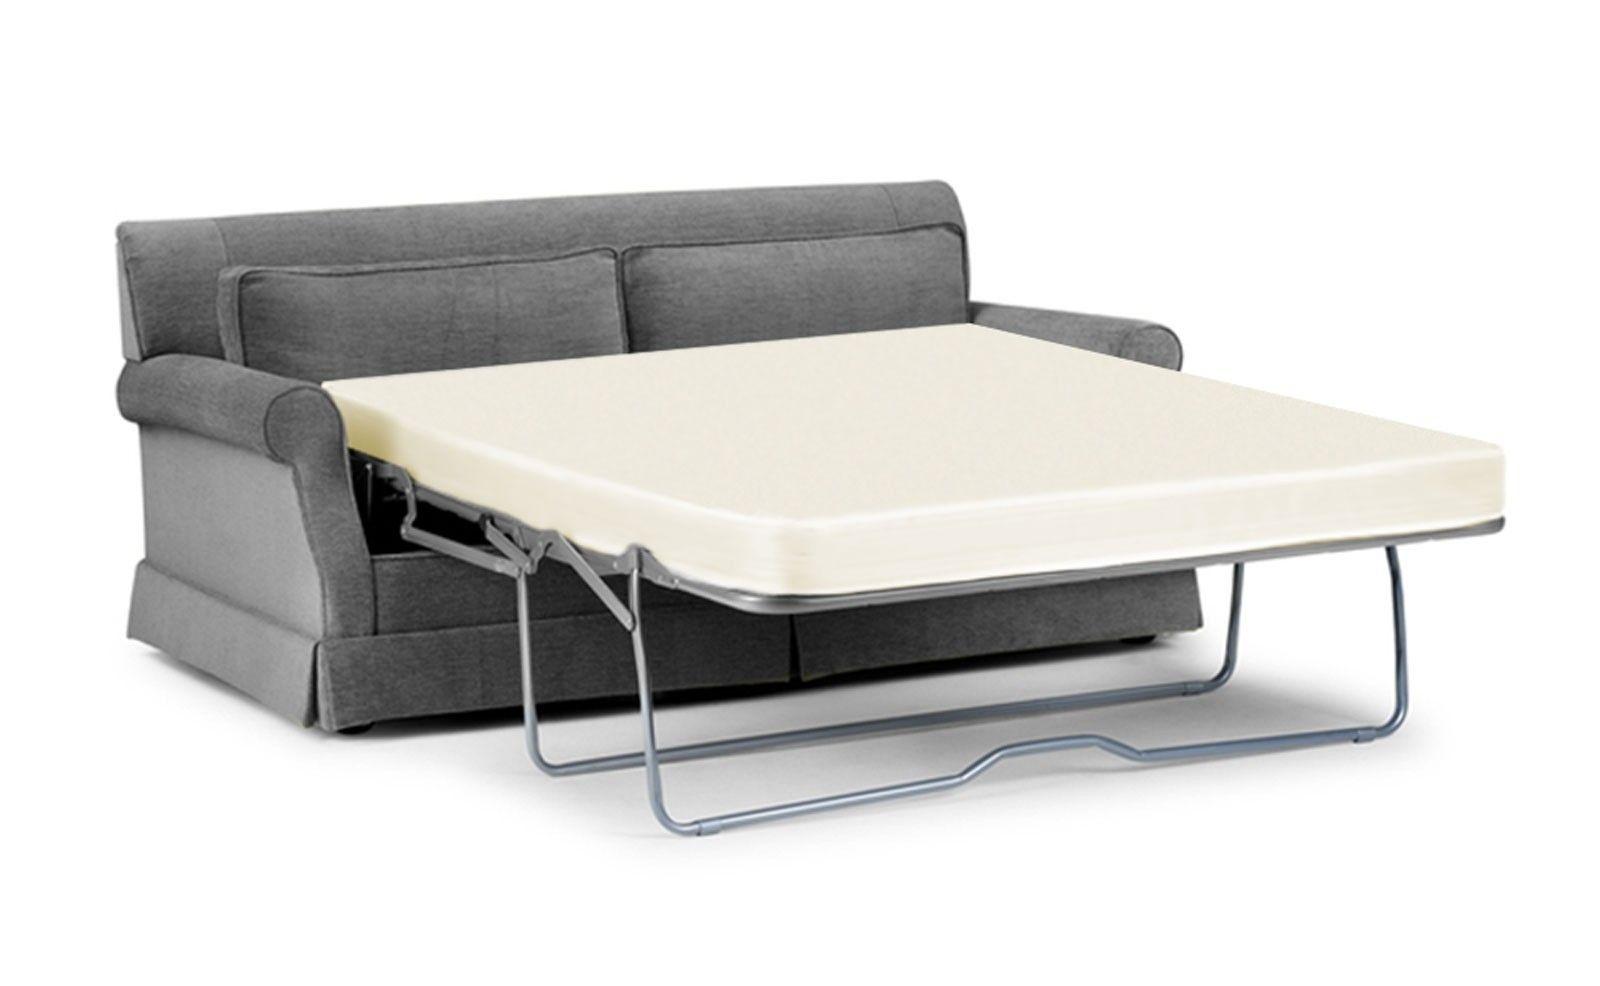 A Sleeper Sofa Mattress Makes Your Sleep Environment More